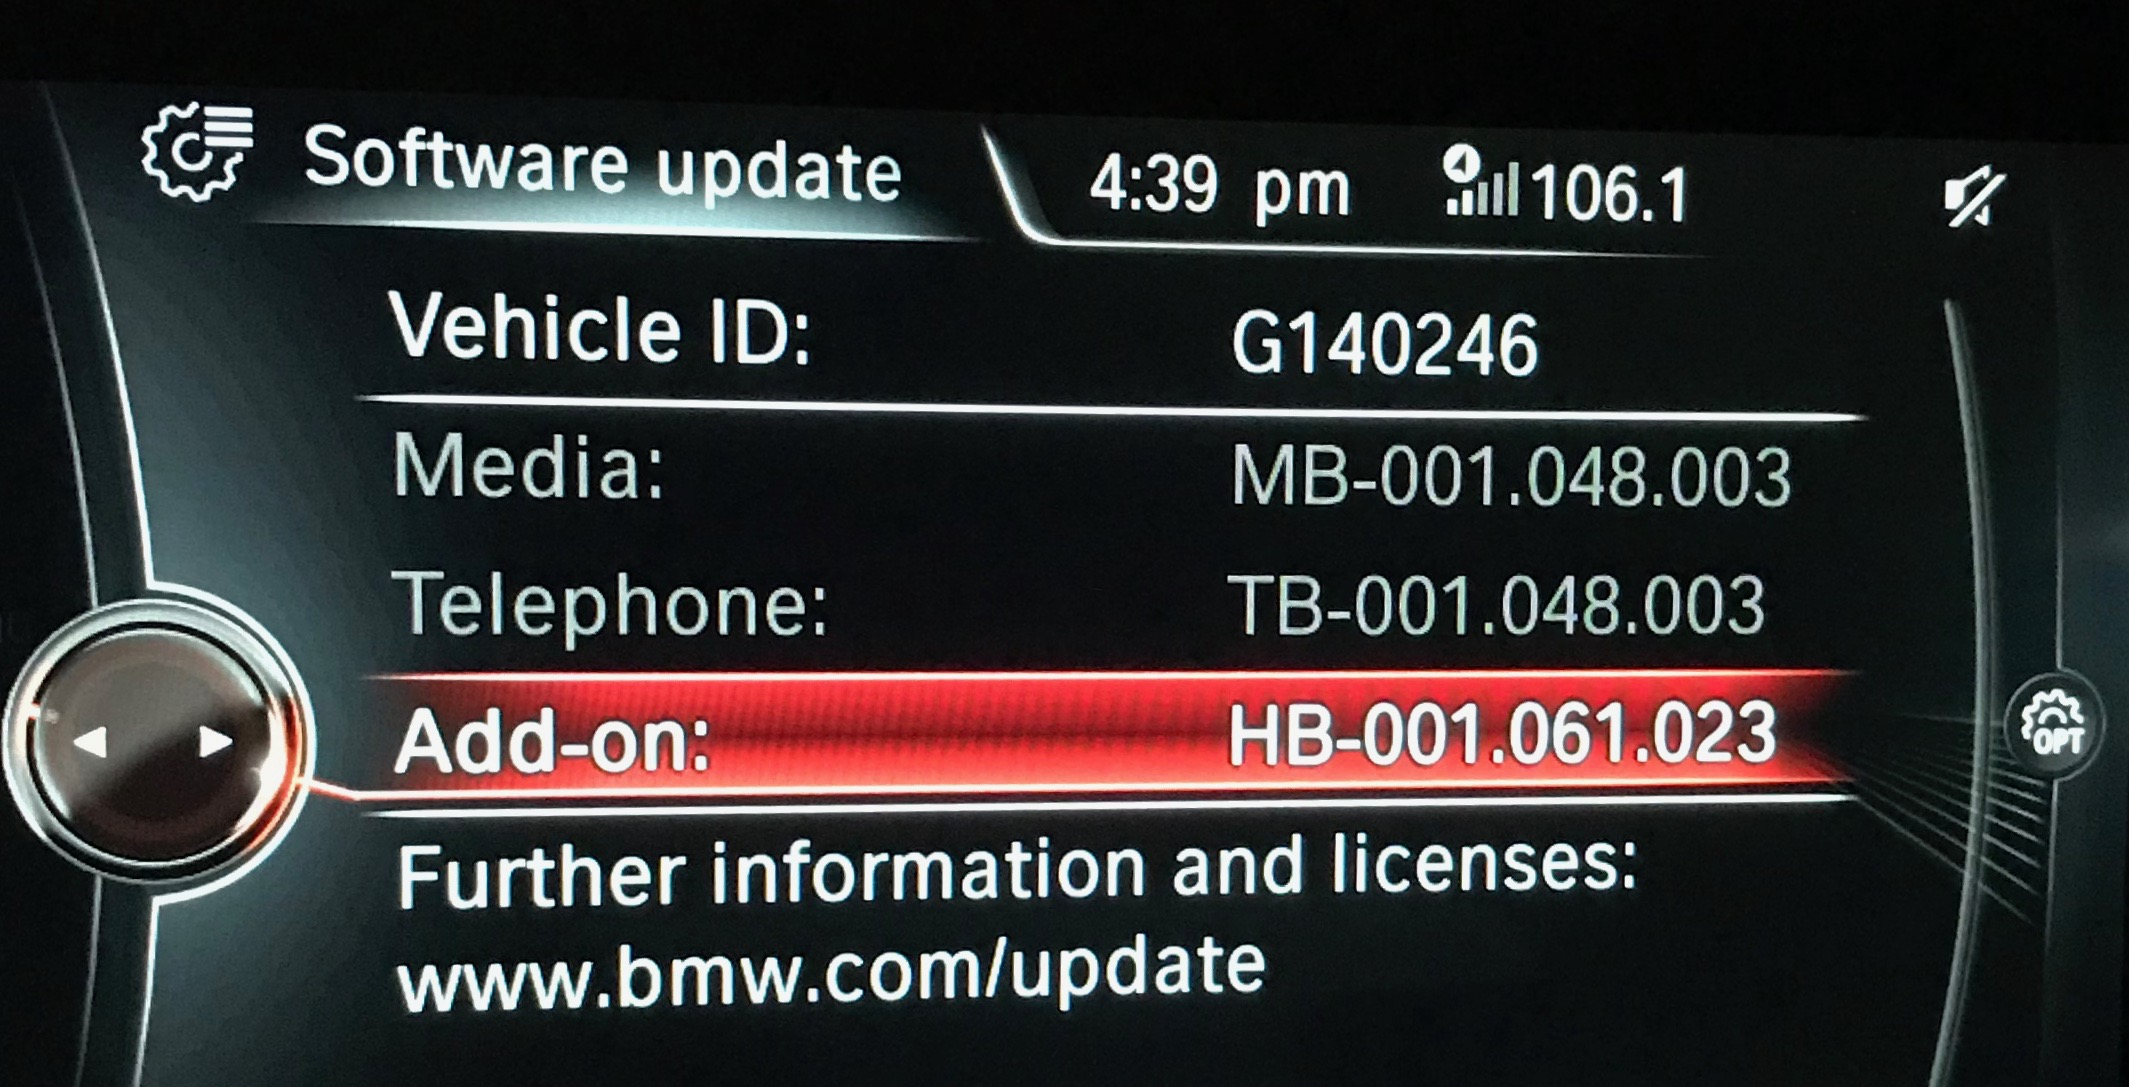 Bmw Software Update >> Bmw Com Update Software Update Released 2018